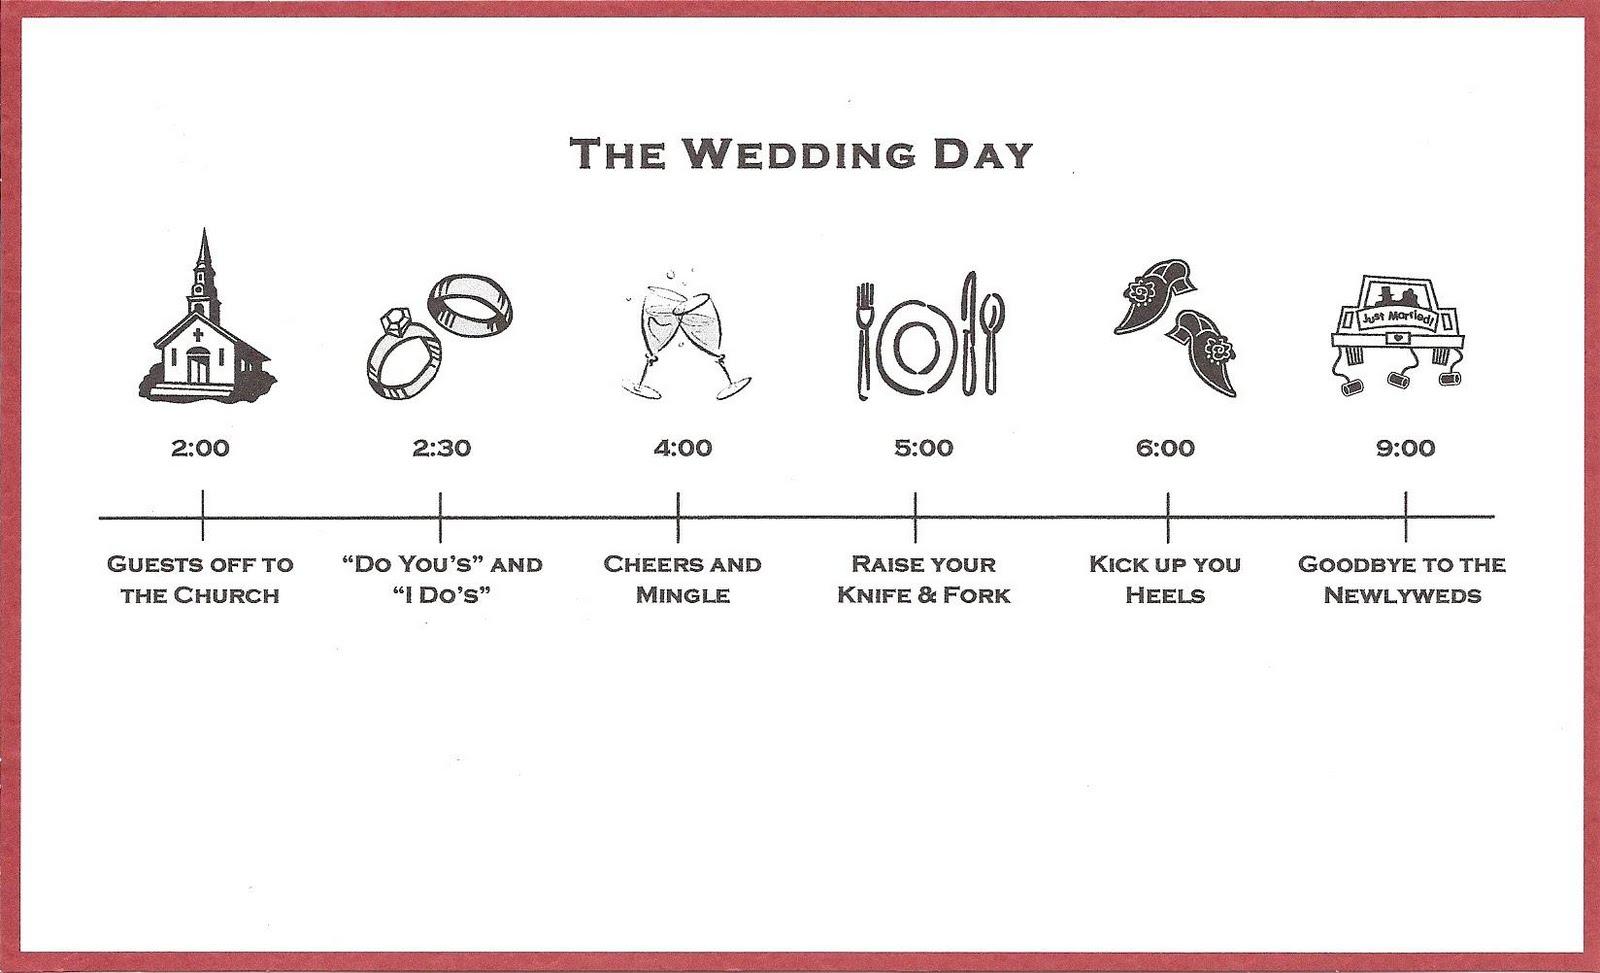 bicoastal bride wedding invitations fun timeline inserts